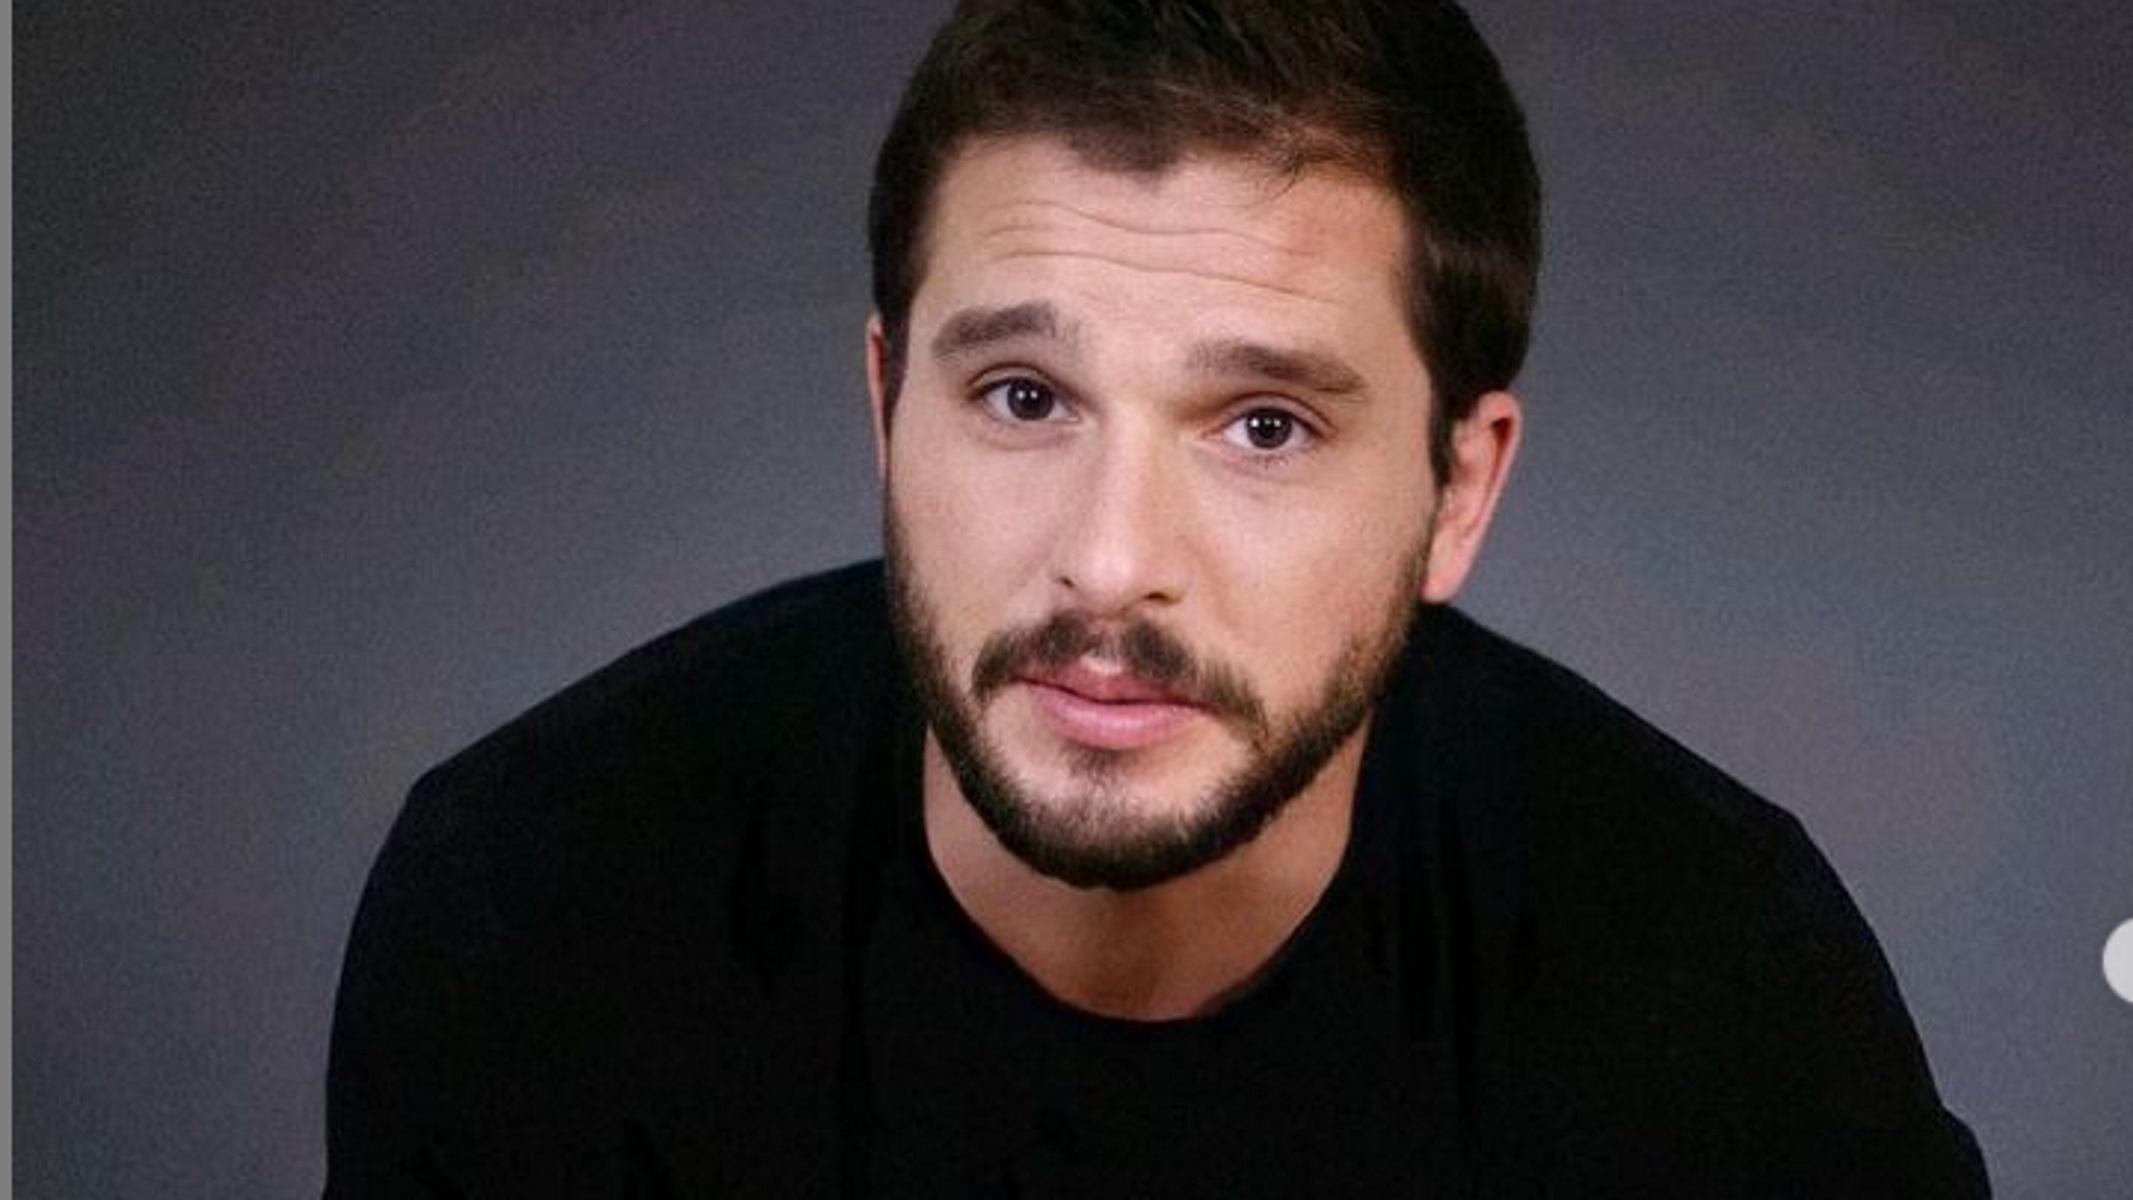 Game of Thrones: «Μου έκανε καλό το πρόγραμμα αποτοξίνωσης μετά τη σειρά»